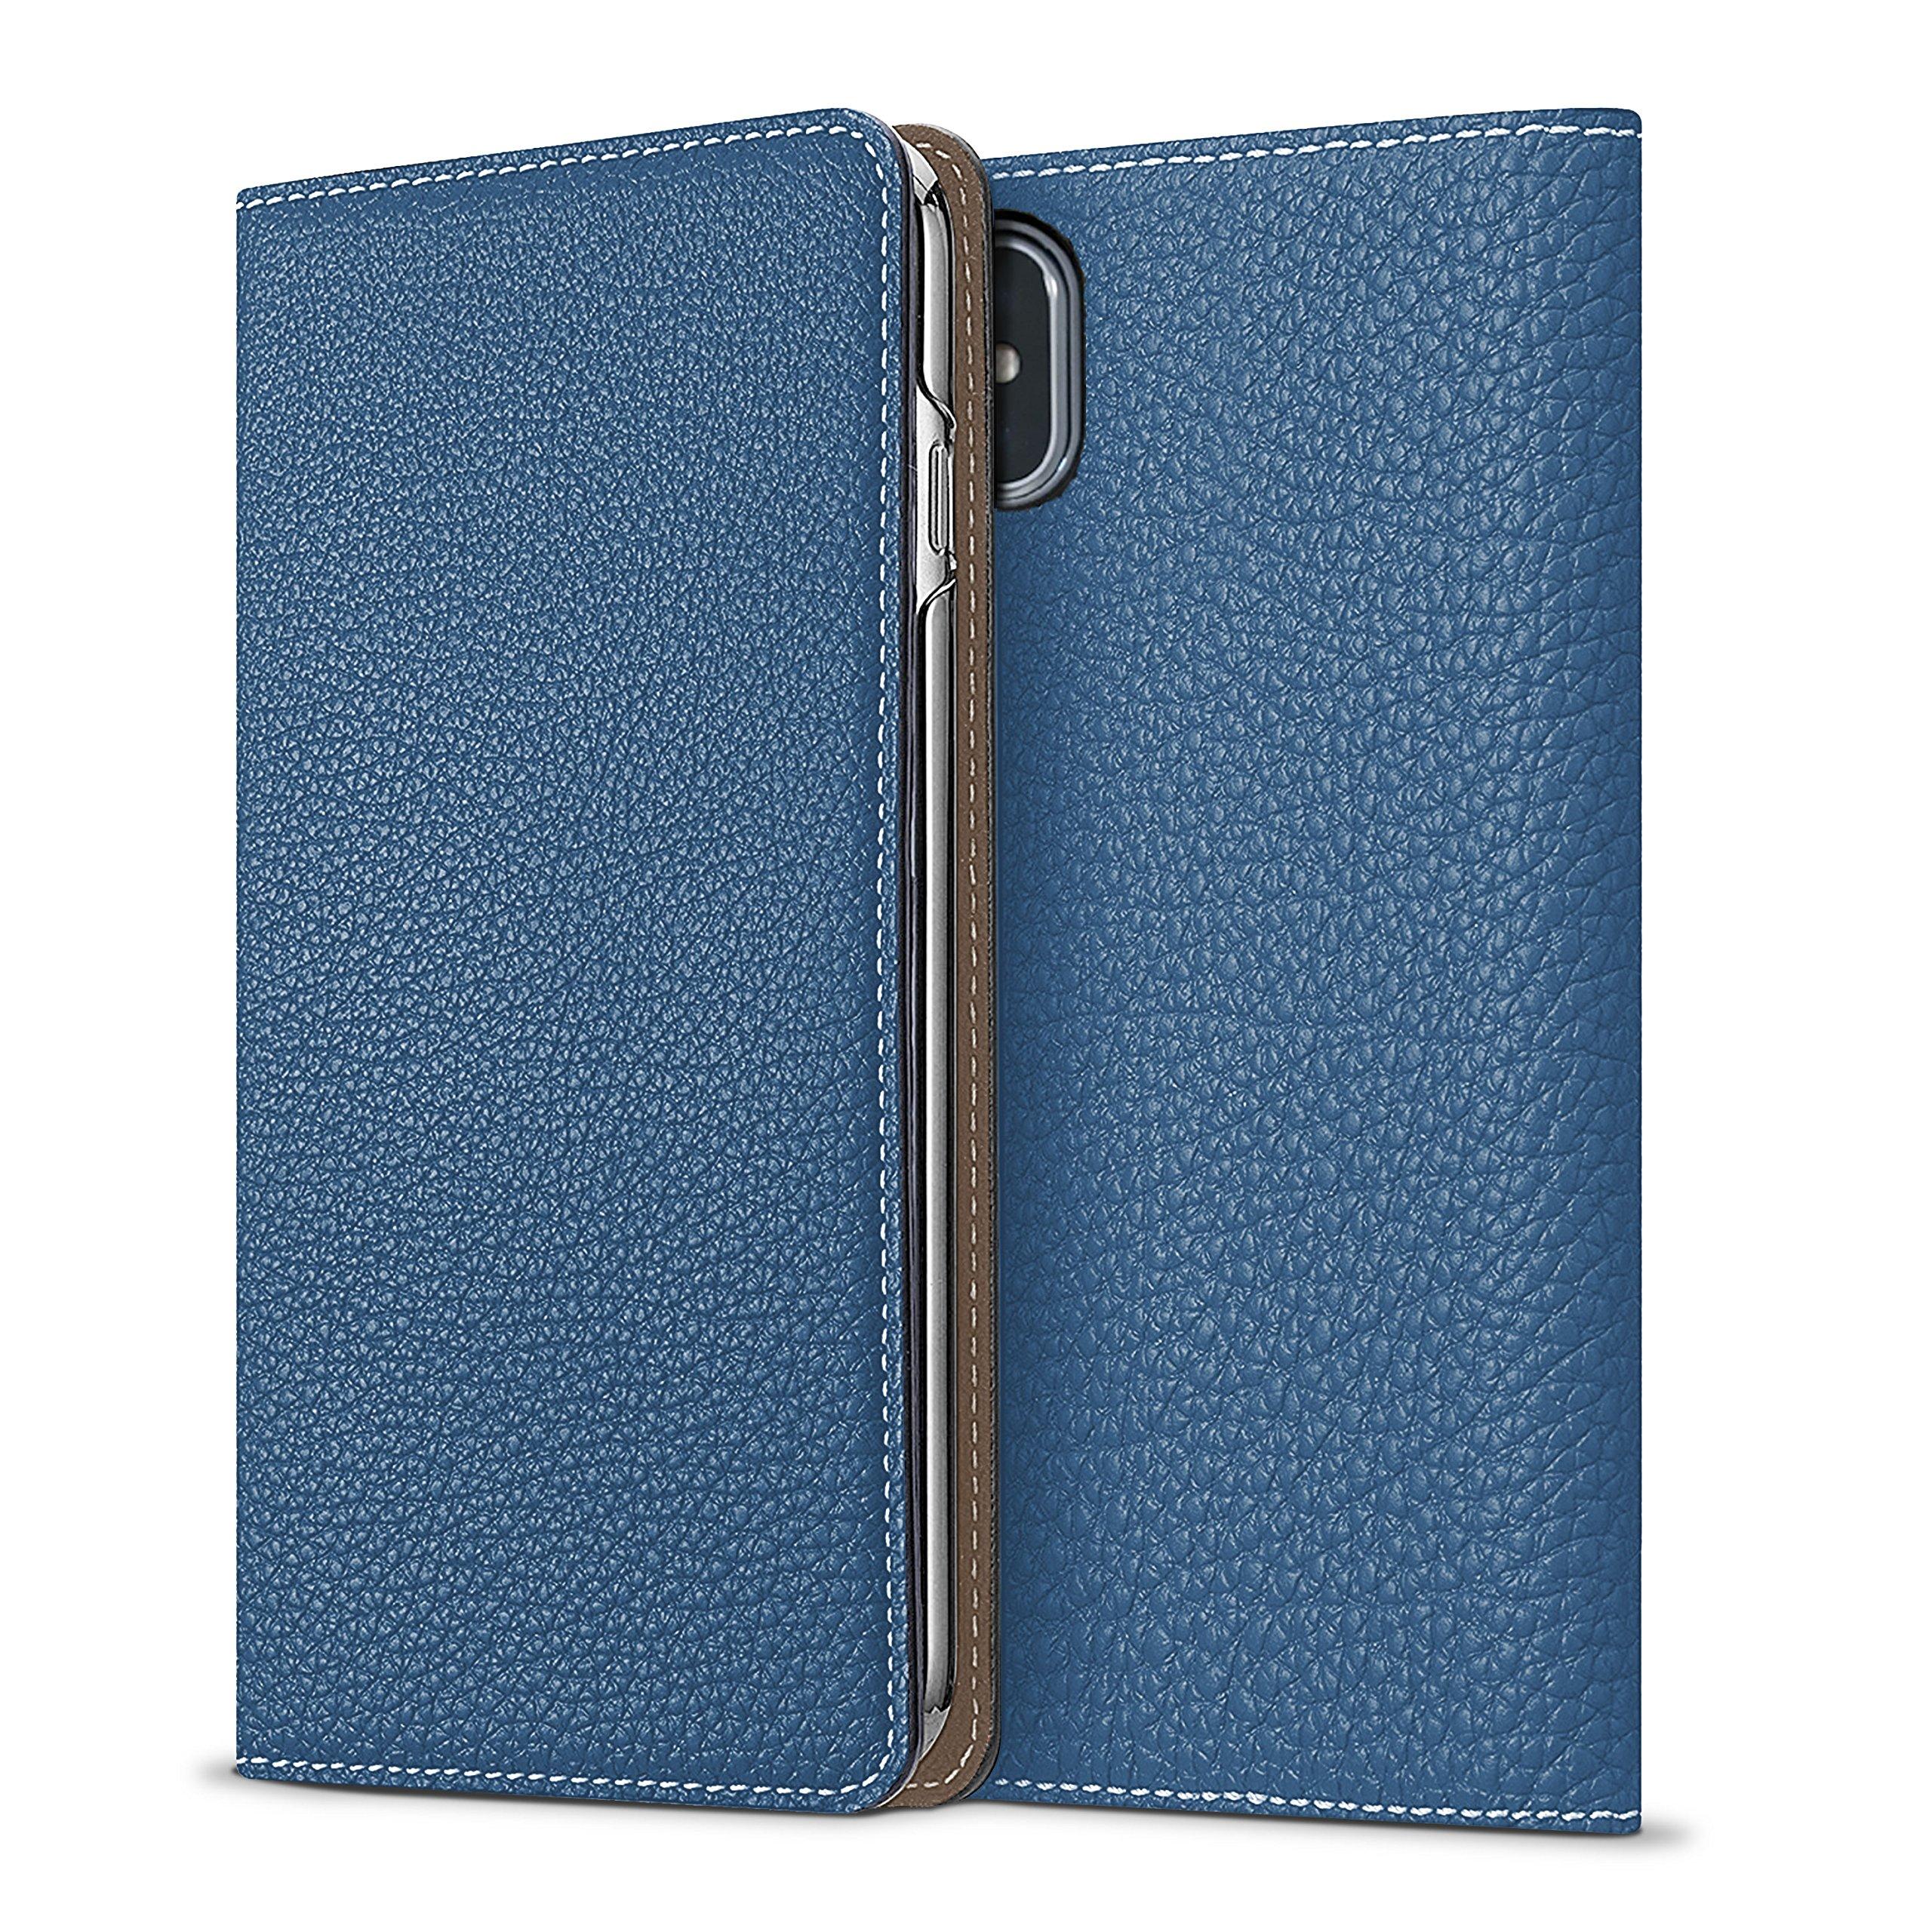 BONAVENTURA iPhone X Leather Wallet Case (Beautiful European Full-Grain Leather) | Luxury Flip Cover Folio Case [iPhone X | Blue & Taupe]